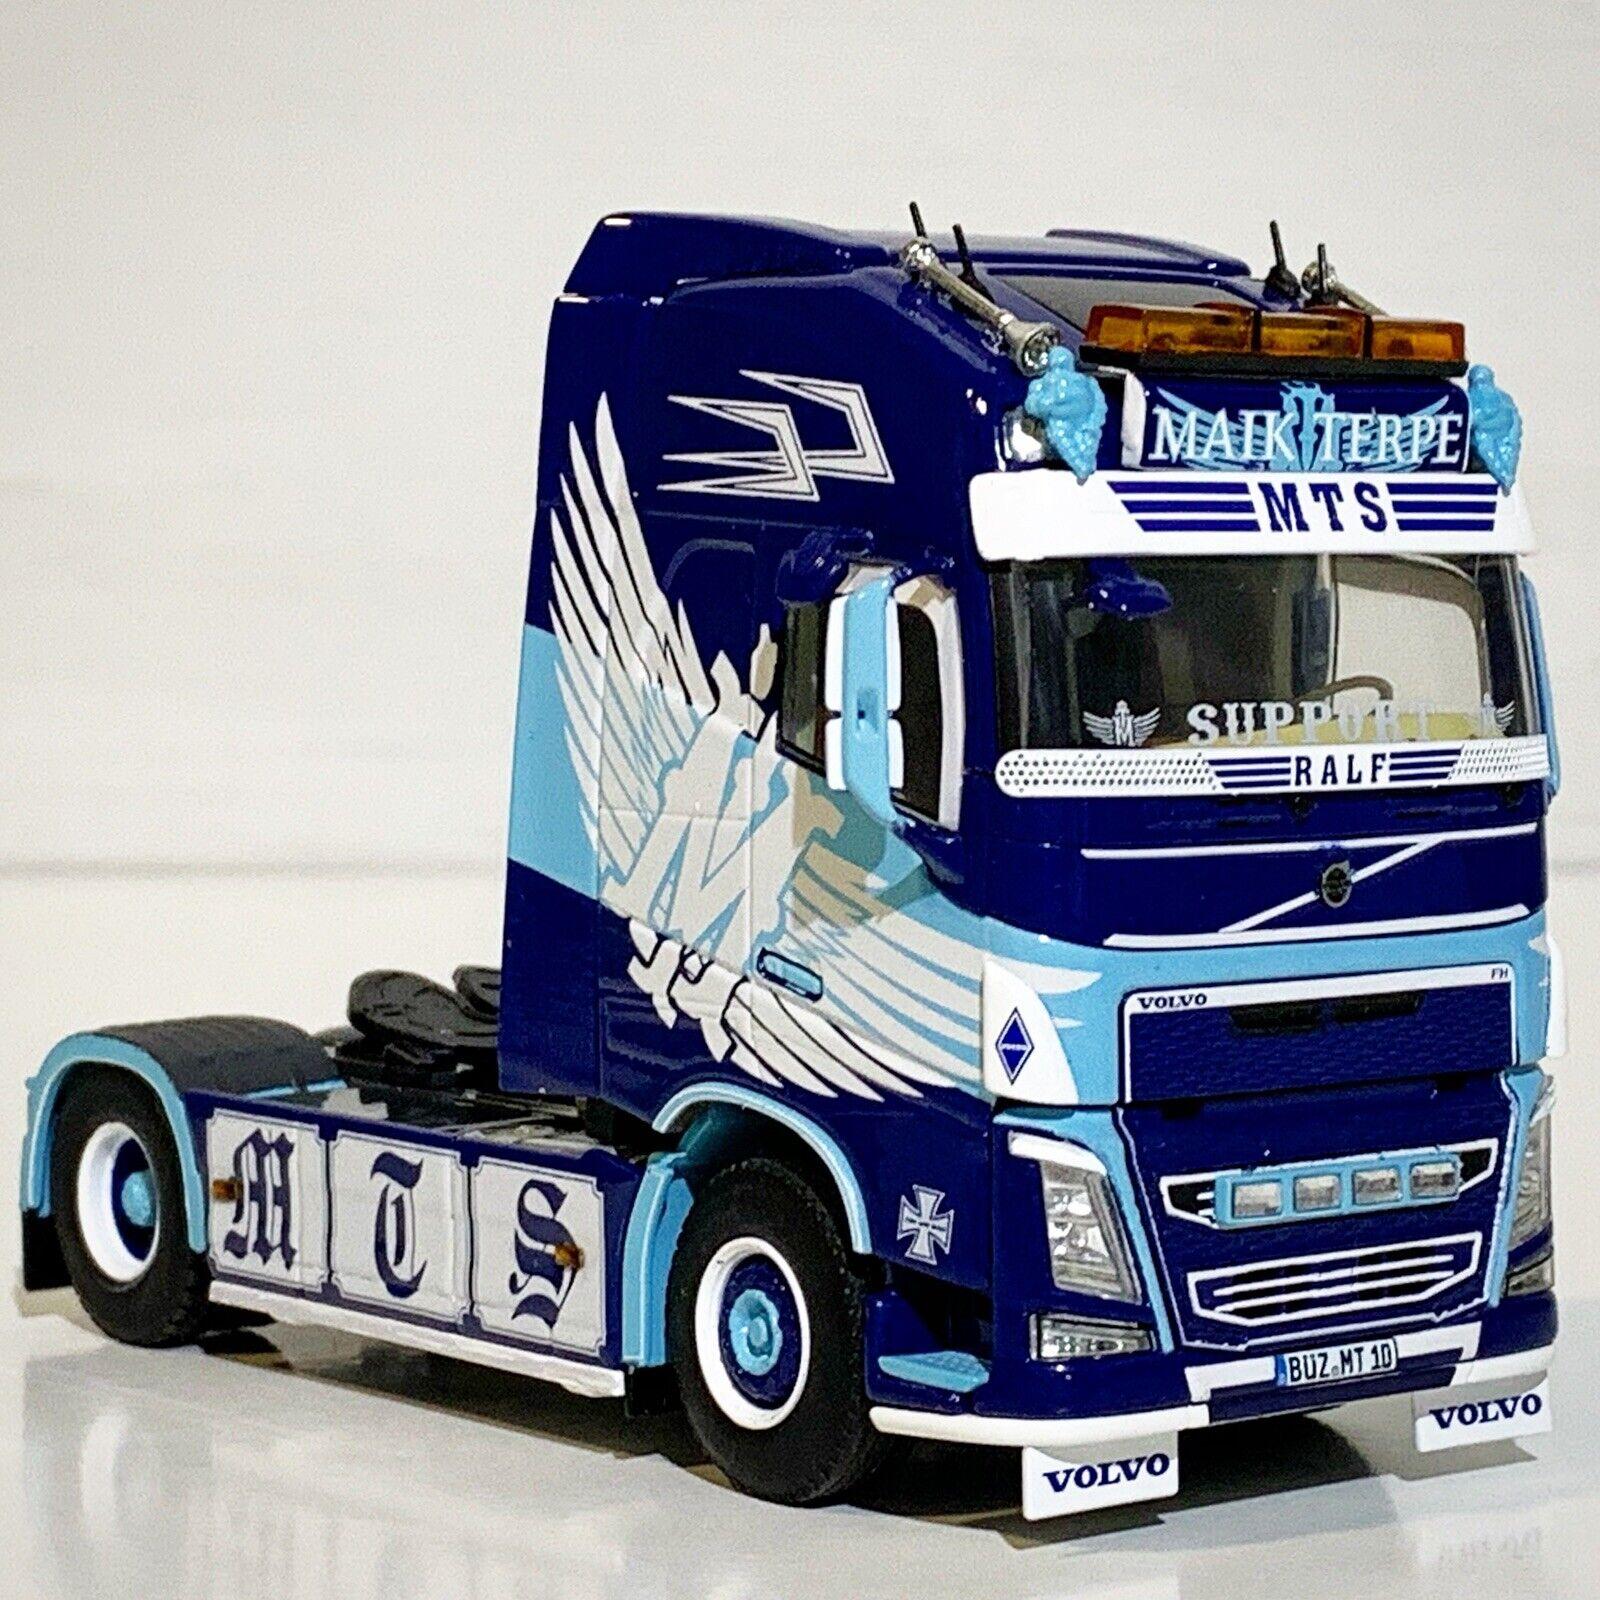 autentico en linea WSI Modelo De Camión Camión Camión Volvo FH4 Globetrojoter XL 4x2  Mts Maik terpe   autorización oficial